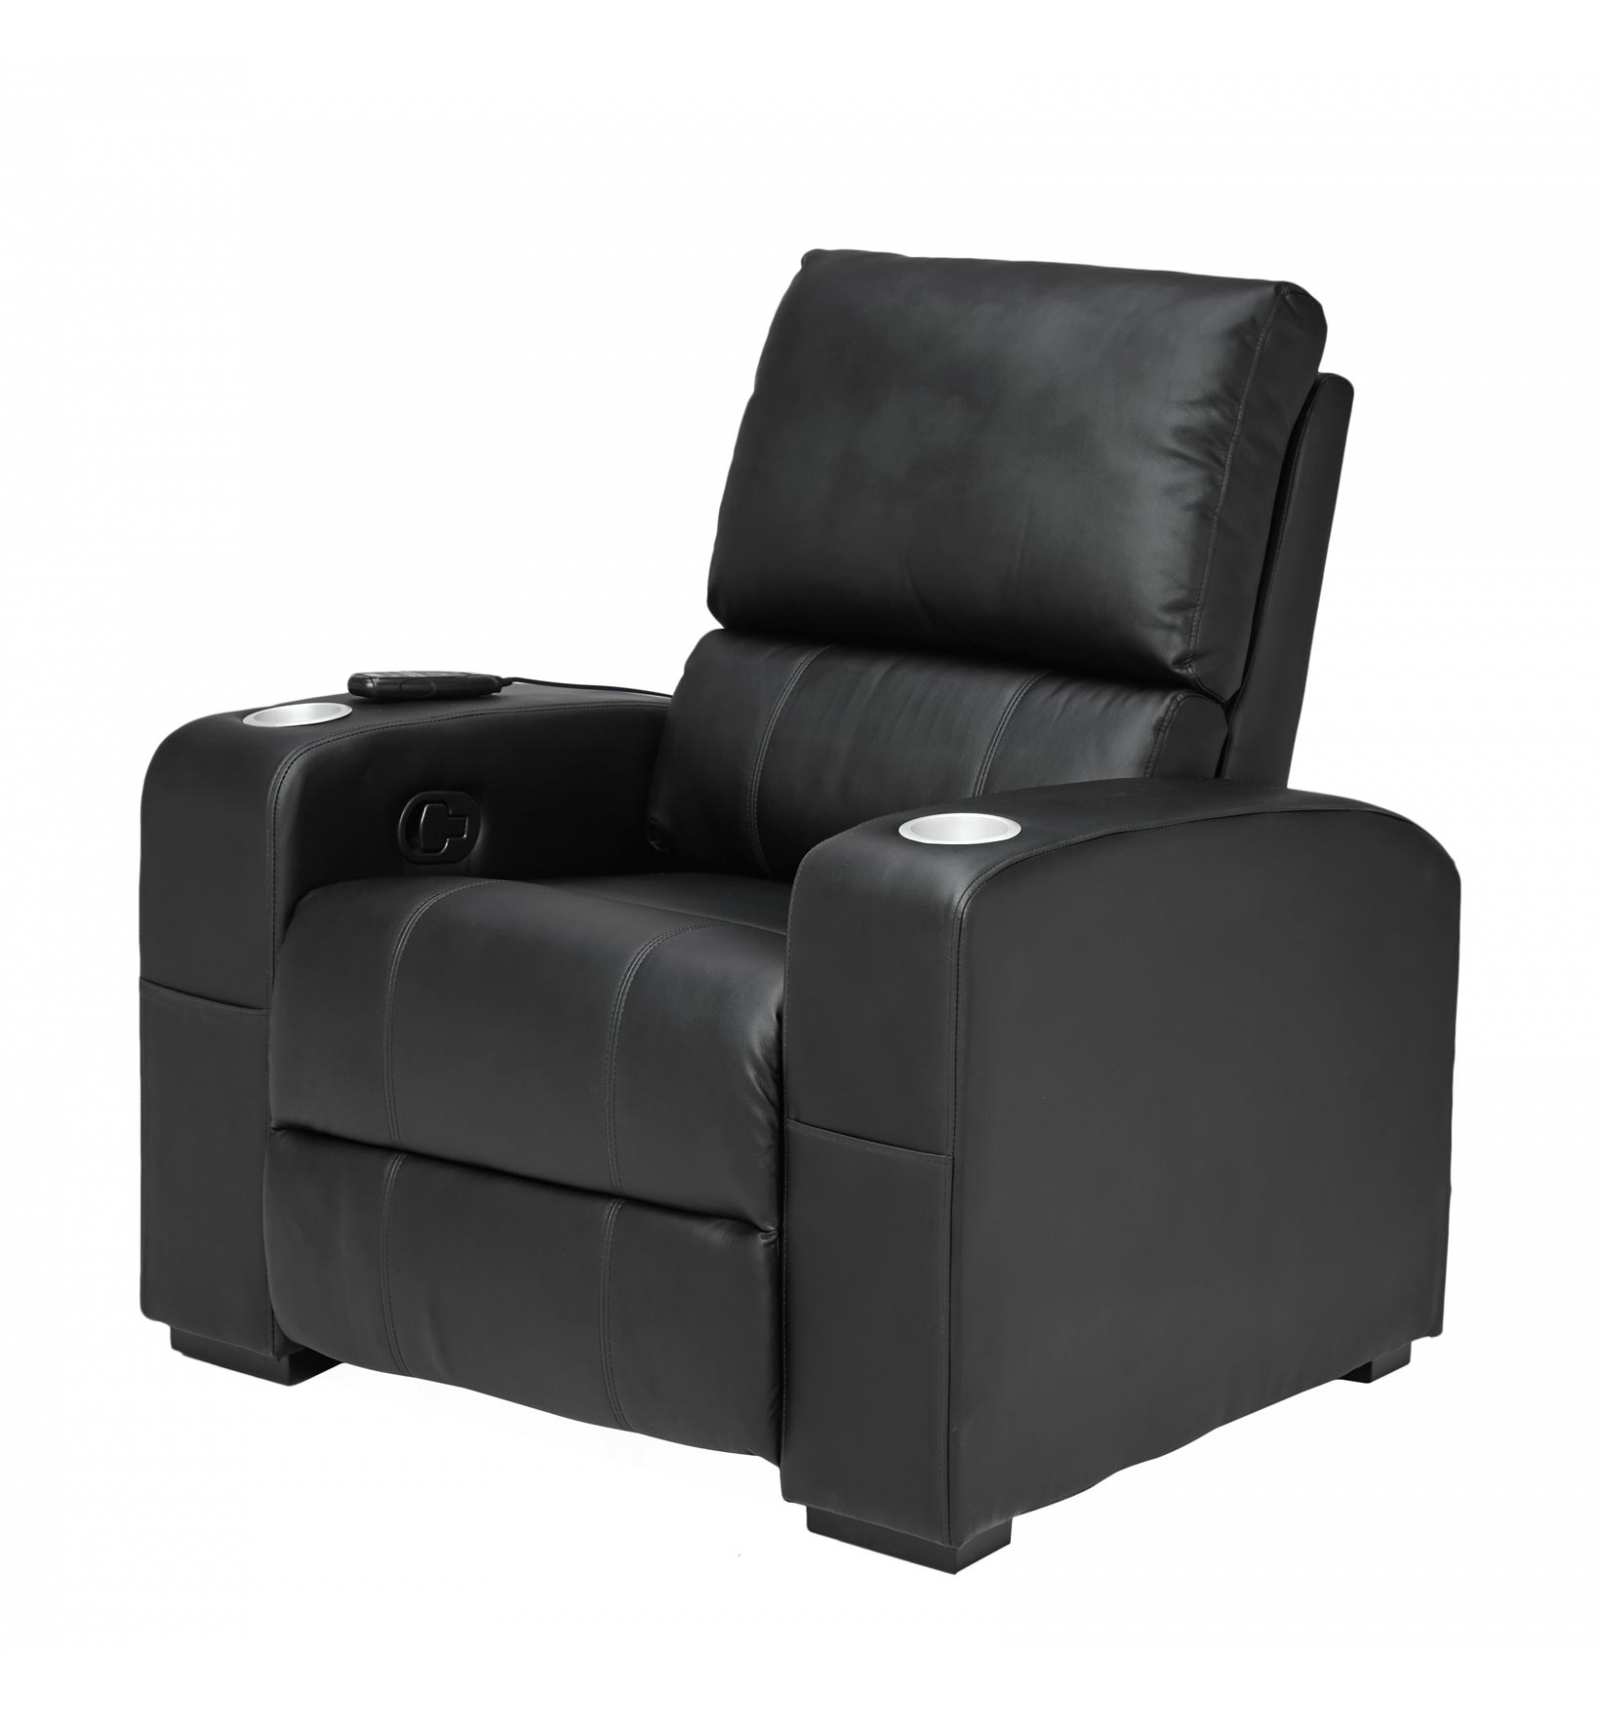 fauteuil relax maison. Black Bedroom Furniture Sets. Home Design Ideas